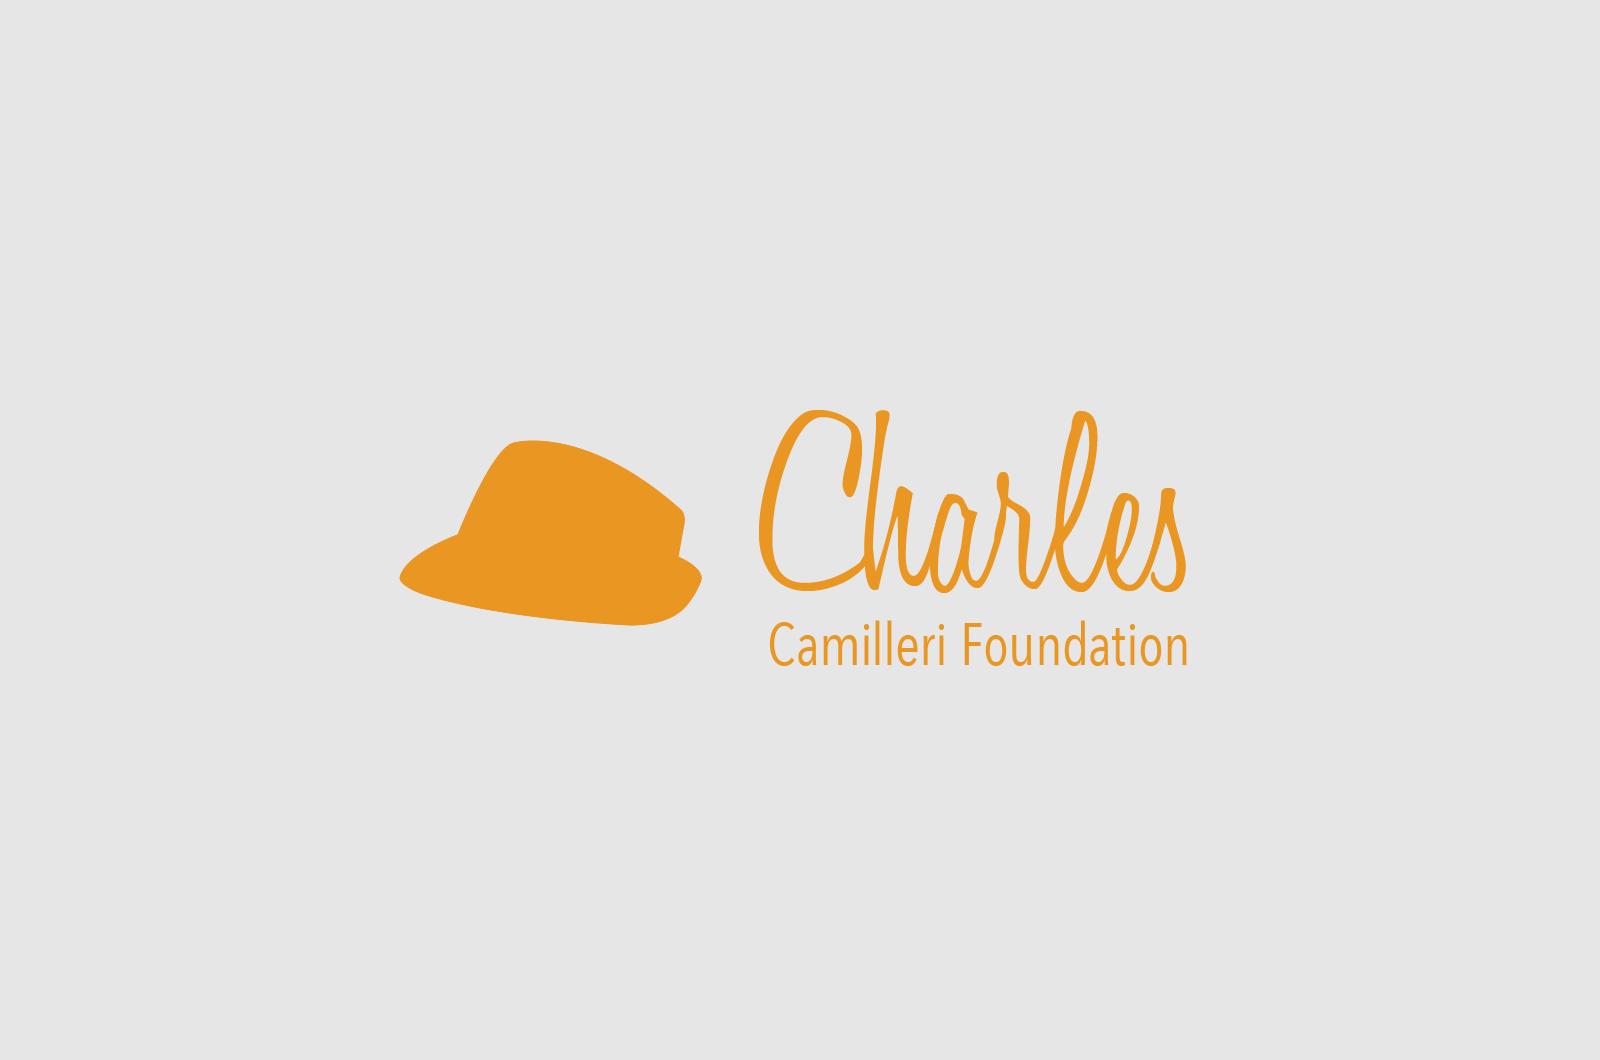 Charles Camilleri Foundation Brand 01 - logo